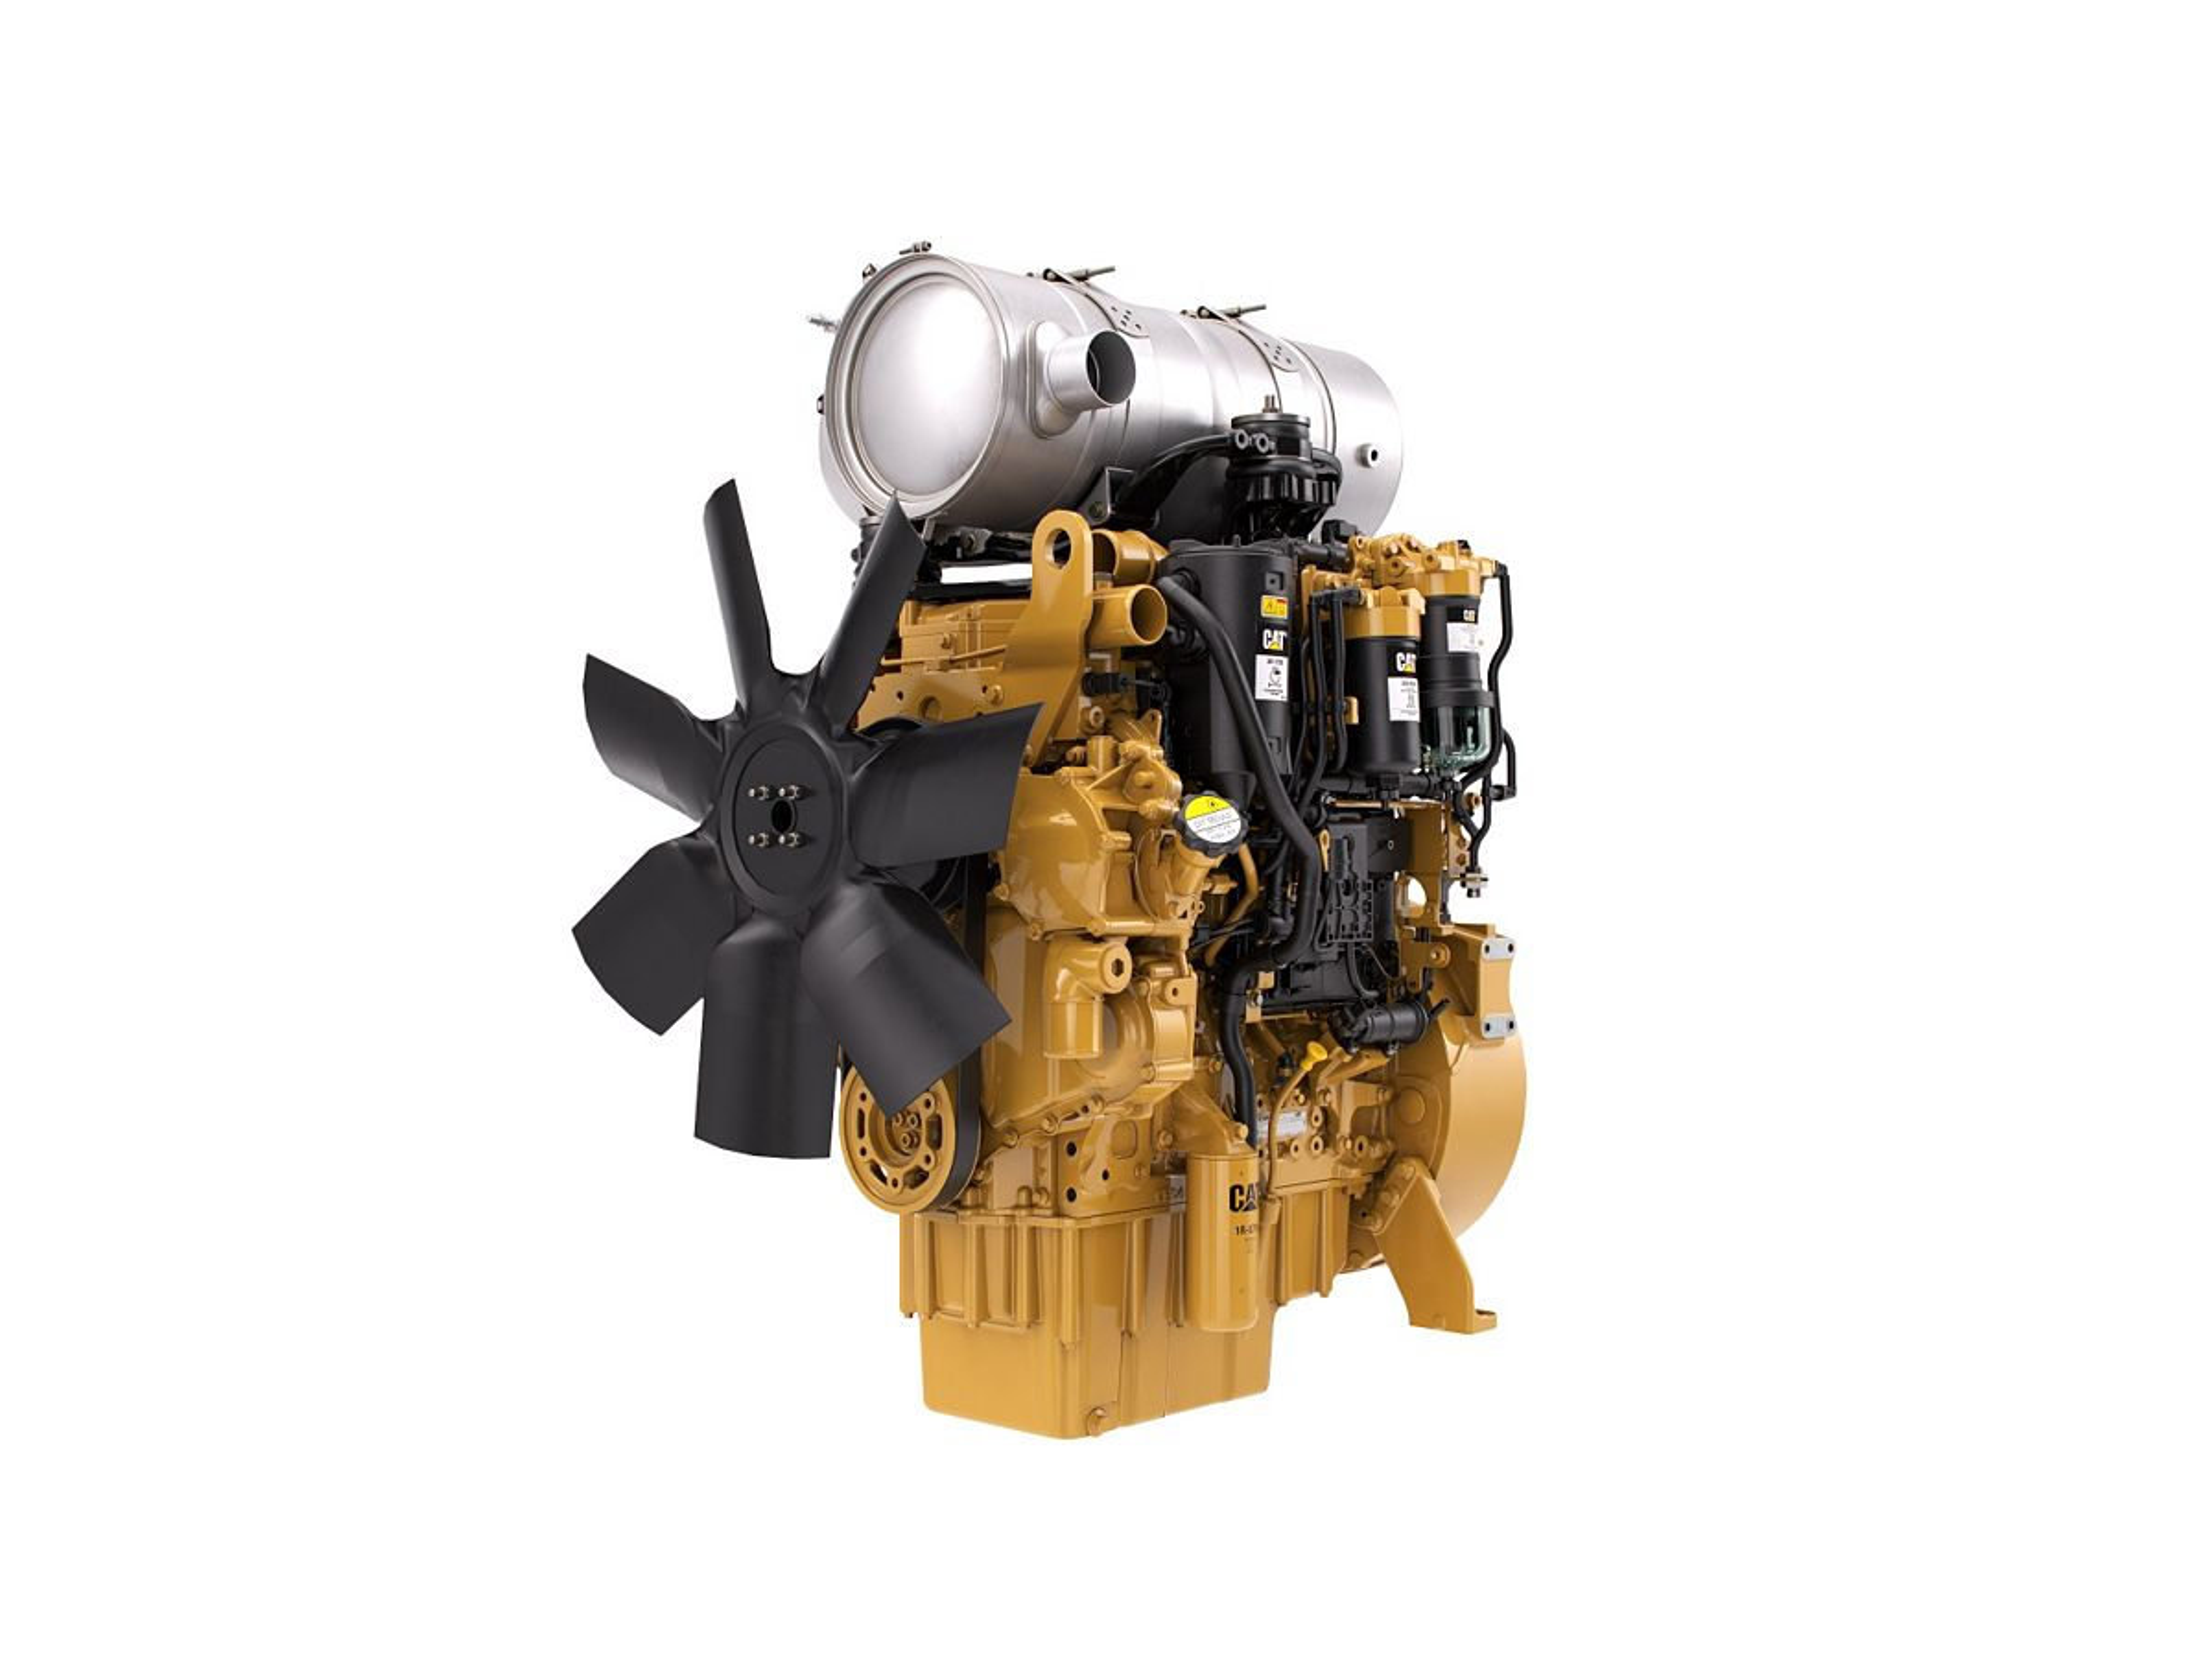 C4.4 Tier 4 Diesel Engines – Highly Regulated